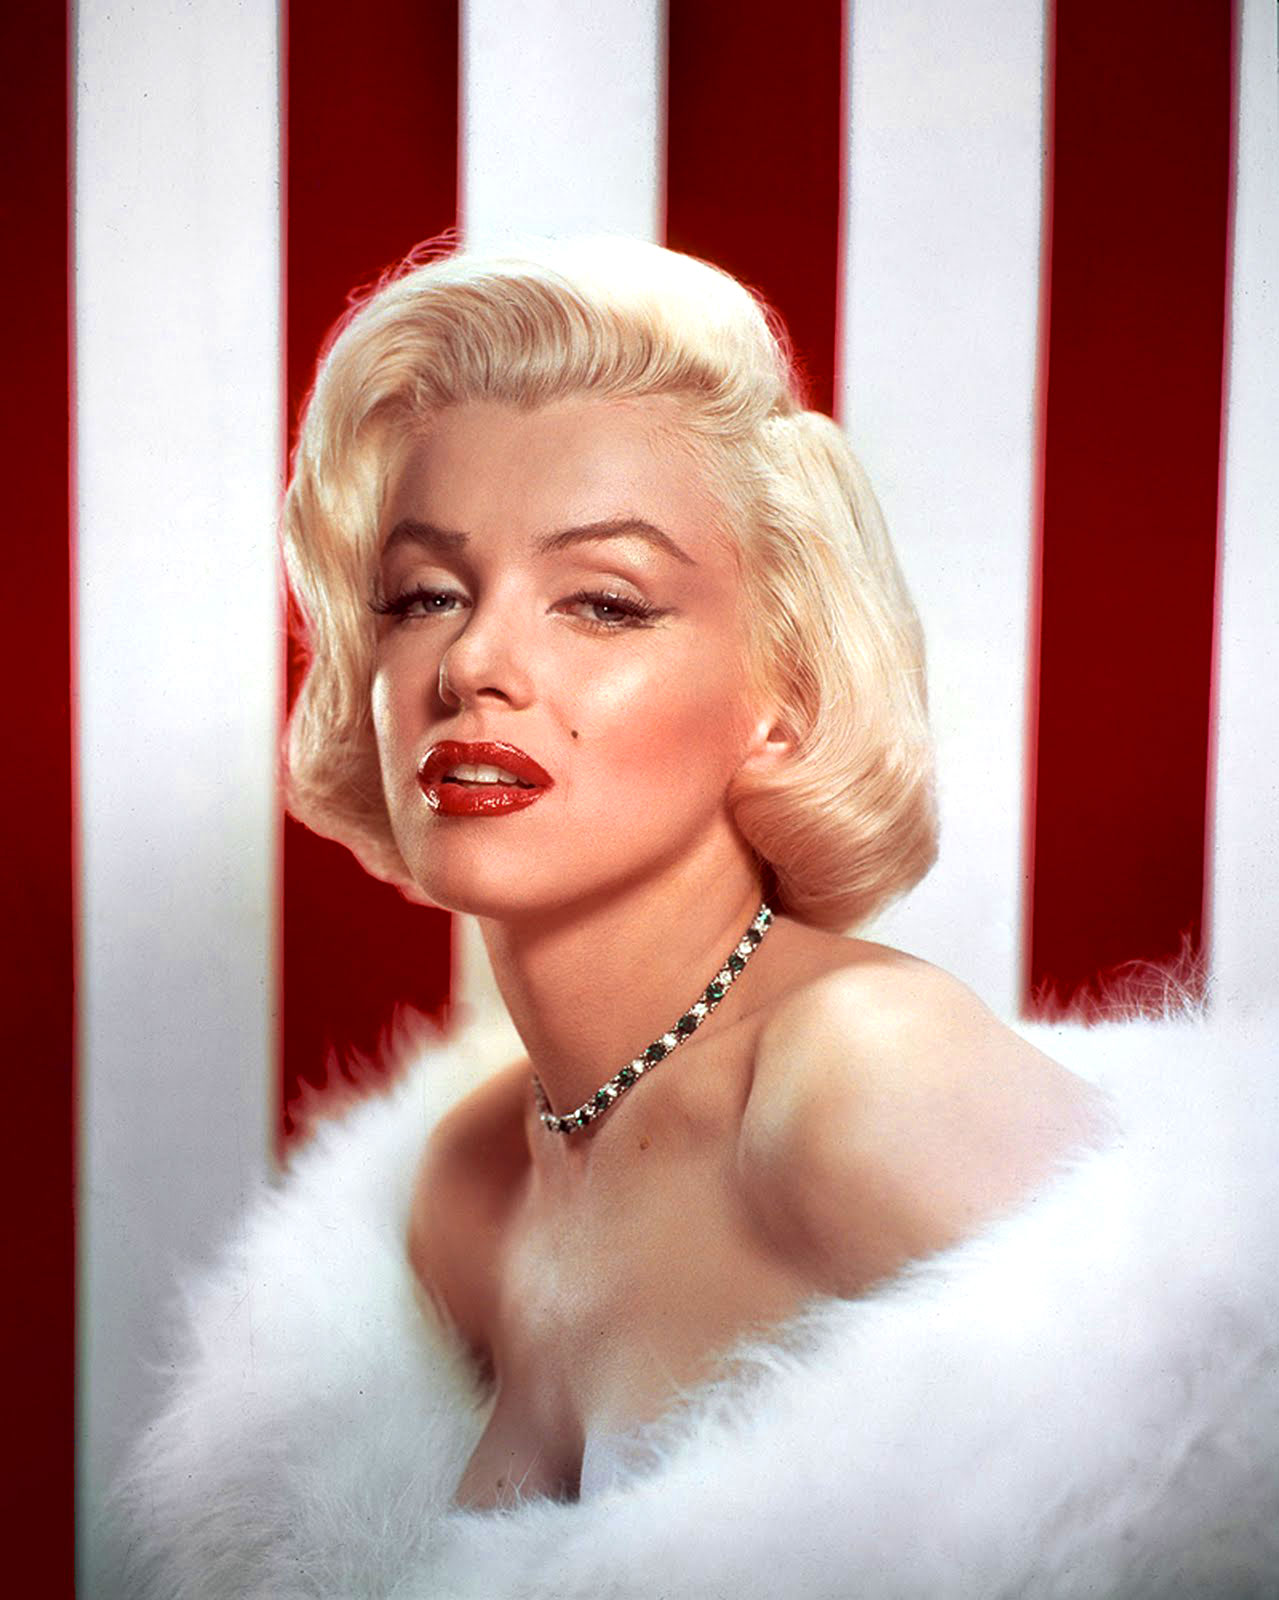 http://2.bp.blogspot.com/-DySajMCmxZQ/T5EdiEfmQWI/AAAAAAAAPPI/7db2mm8ijbw/s1600/Marilyn-Monroe-American-Flag.jpg